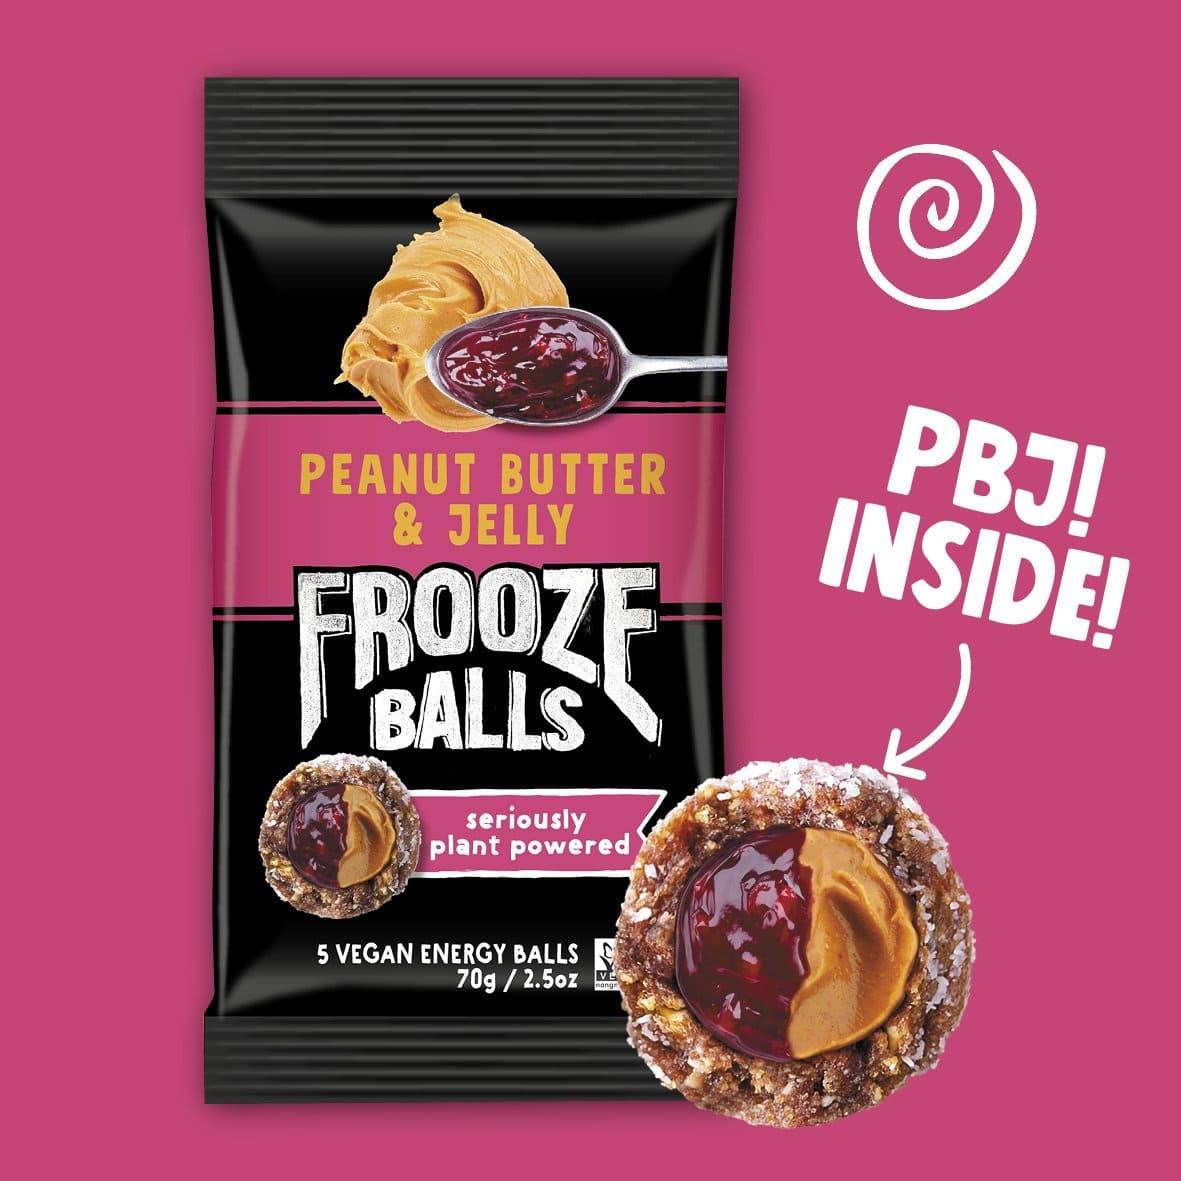 beverly hills magazine vegan snacks healthy vegan sweets plant based frooze balls #froozeballs #bevhillsmag #giftguide #coolgifts #vegansnacksicanbuy